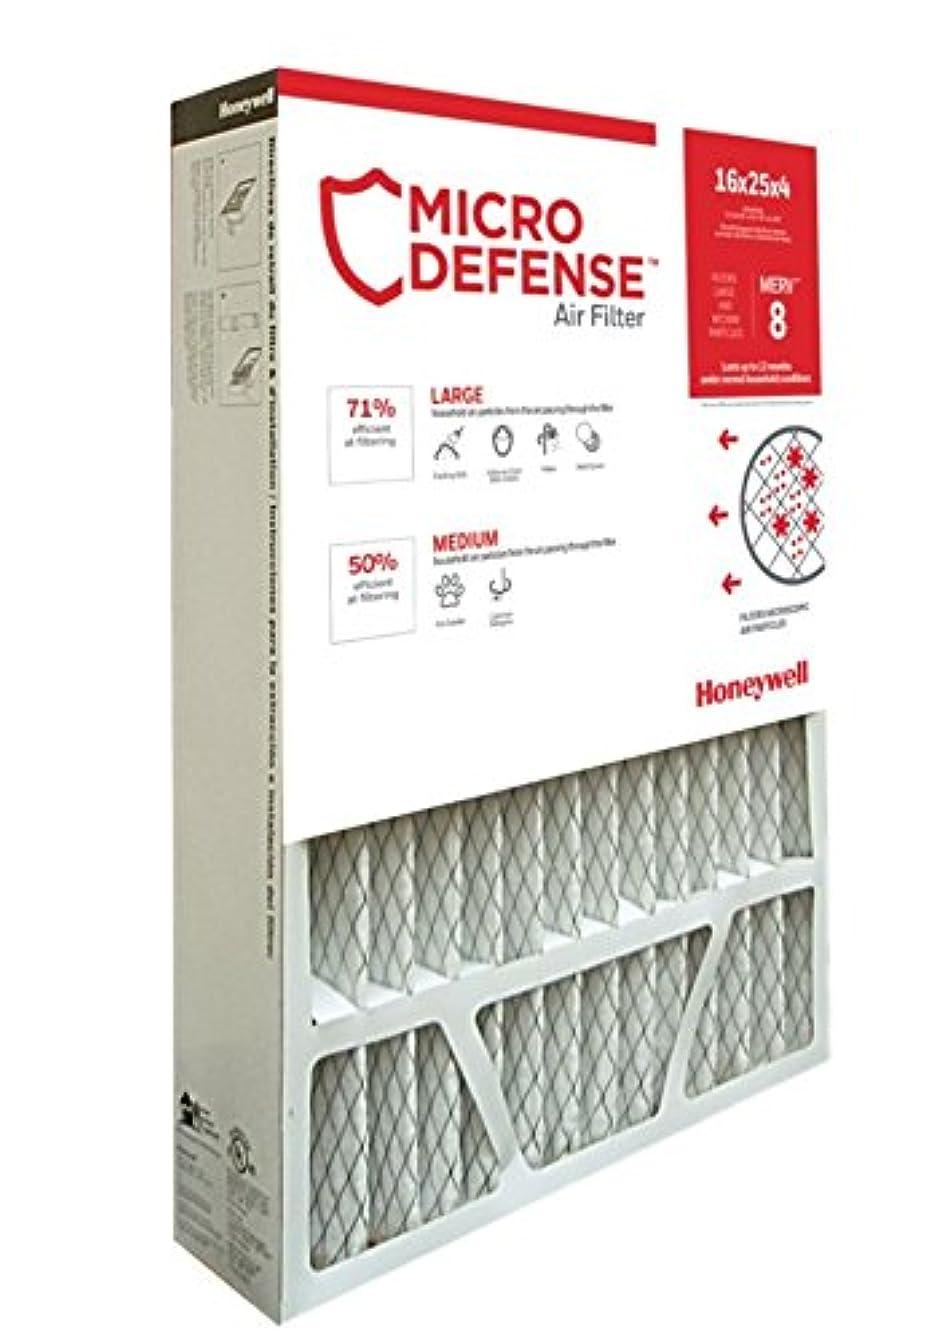 MicroDefense by Honeywell CF100A1620/U Filter, 16x20x4.38